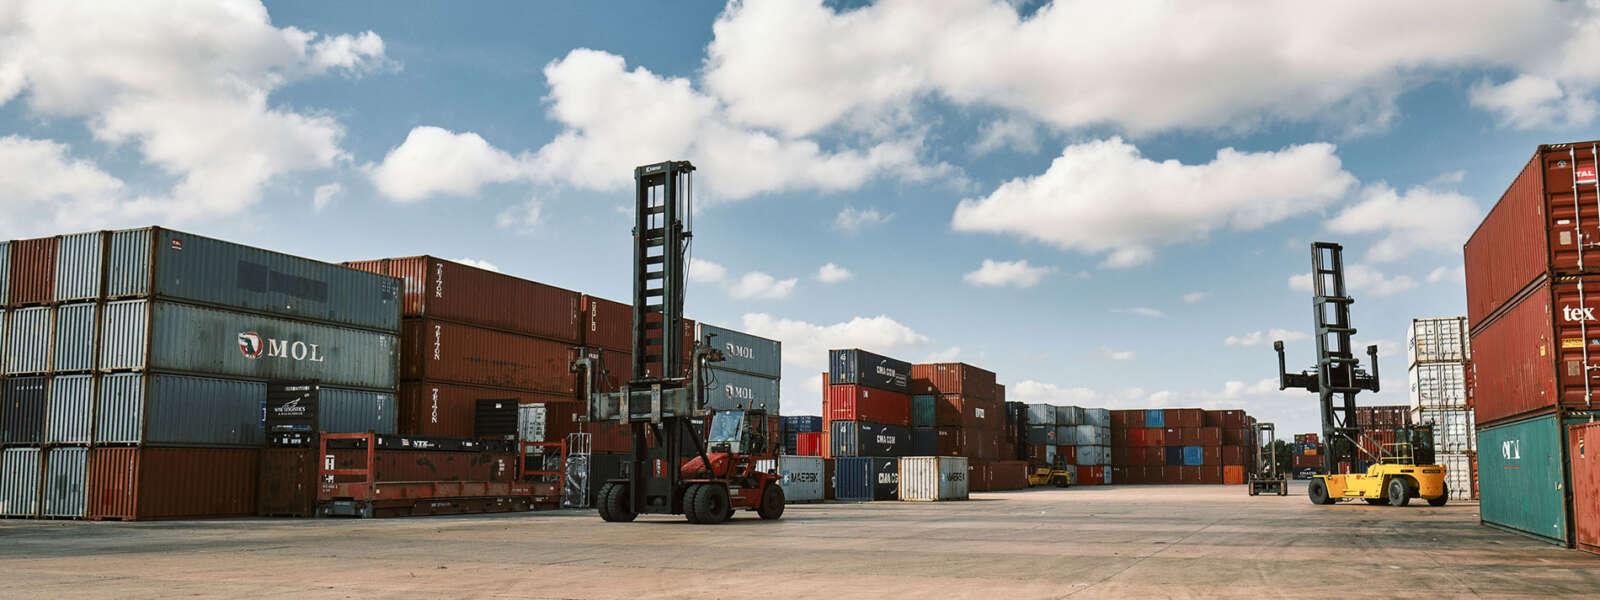 intercontainer-deposito-6